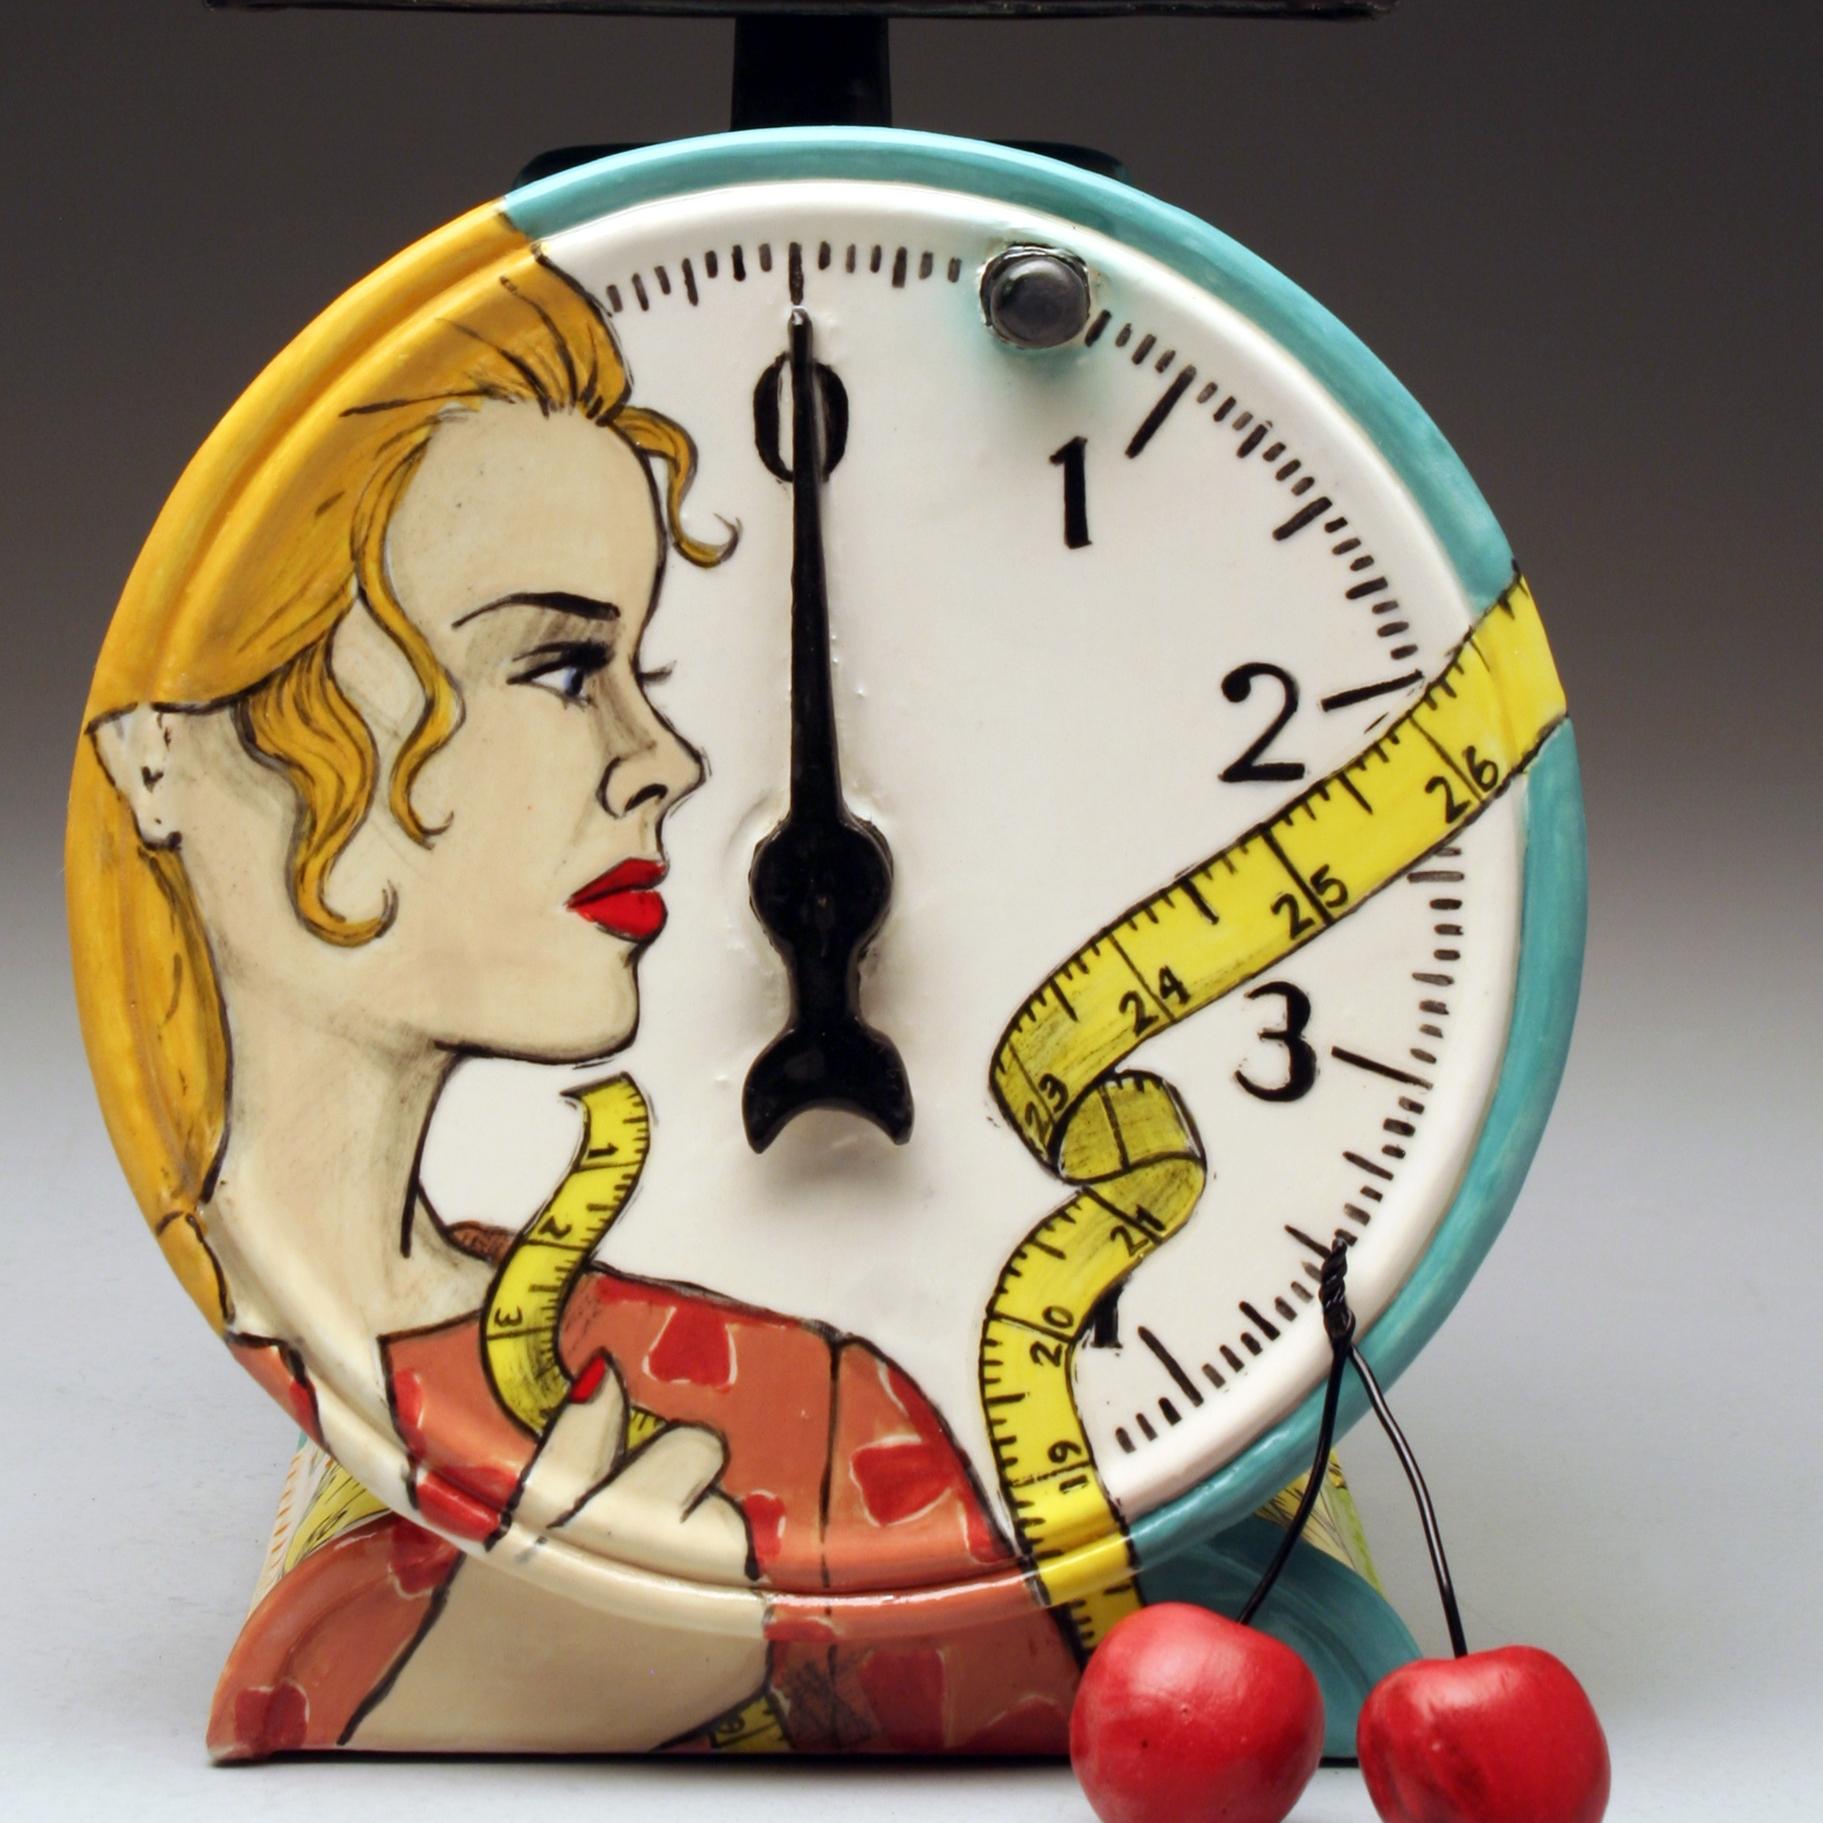 Shalene Valenzuela: Weights & Measures